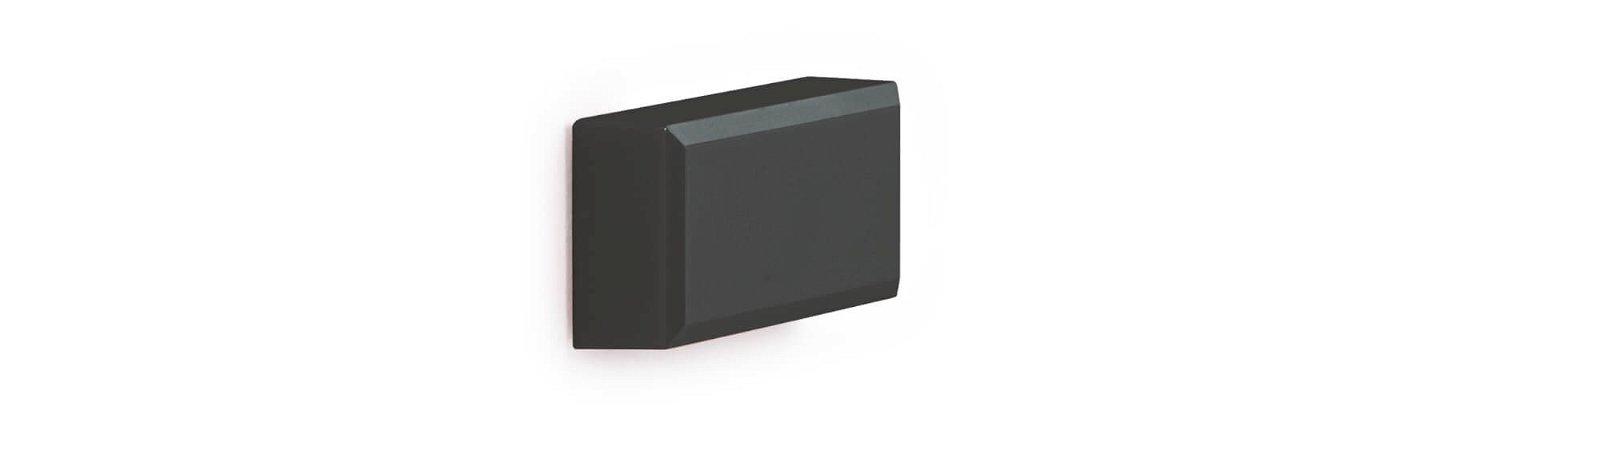 Facetterand-Magnet MAULpro 53 x 18 mm, 1 kg, 20 St./Set, schwarz